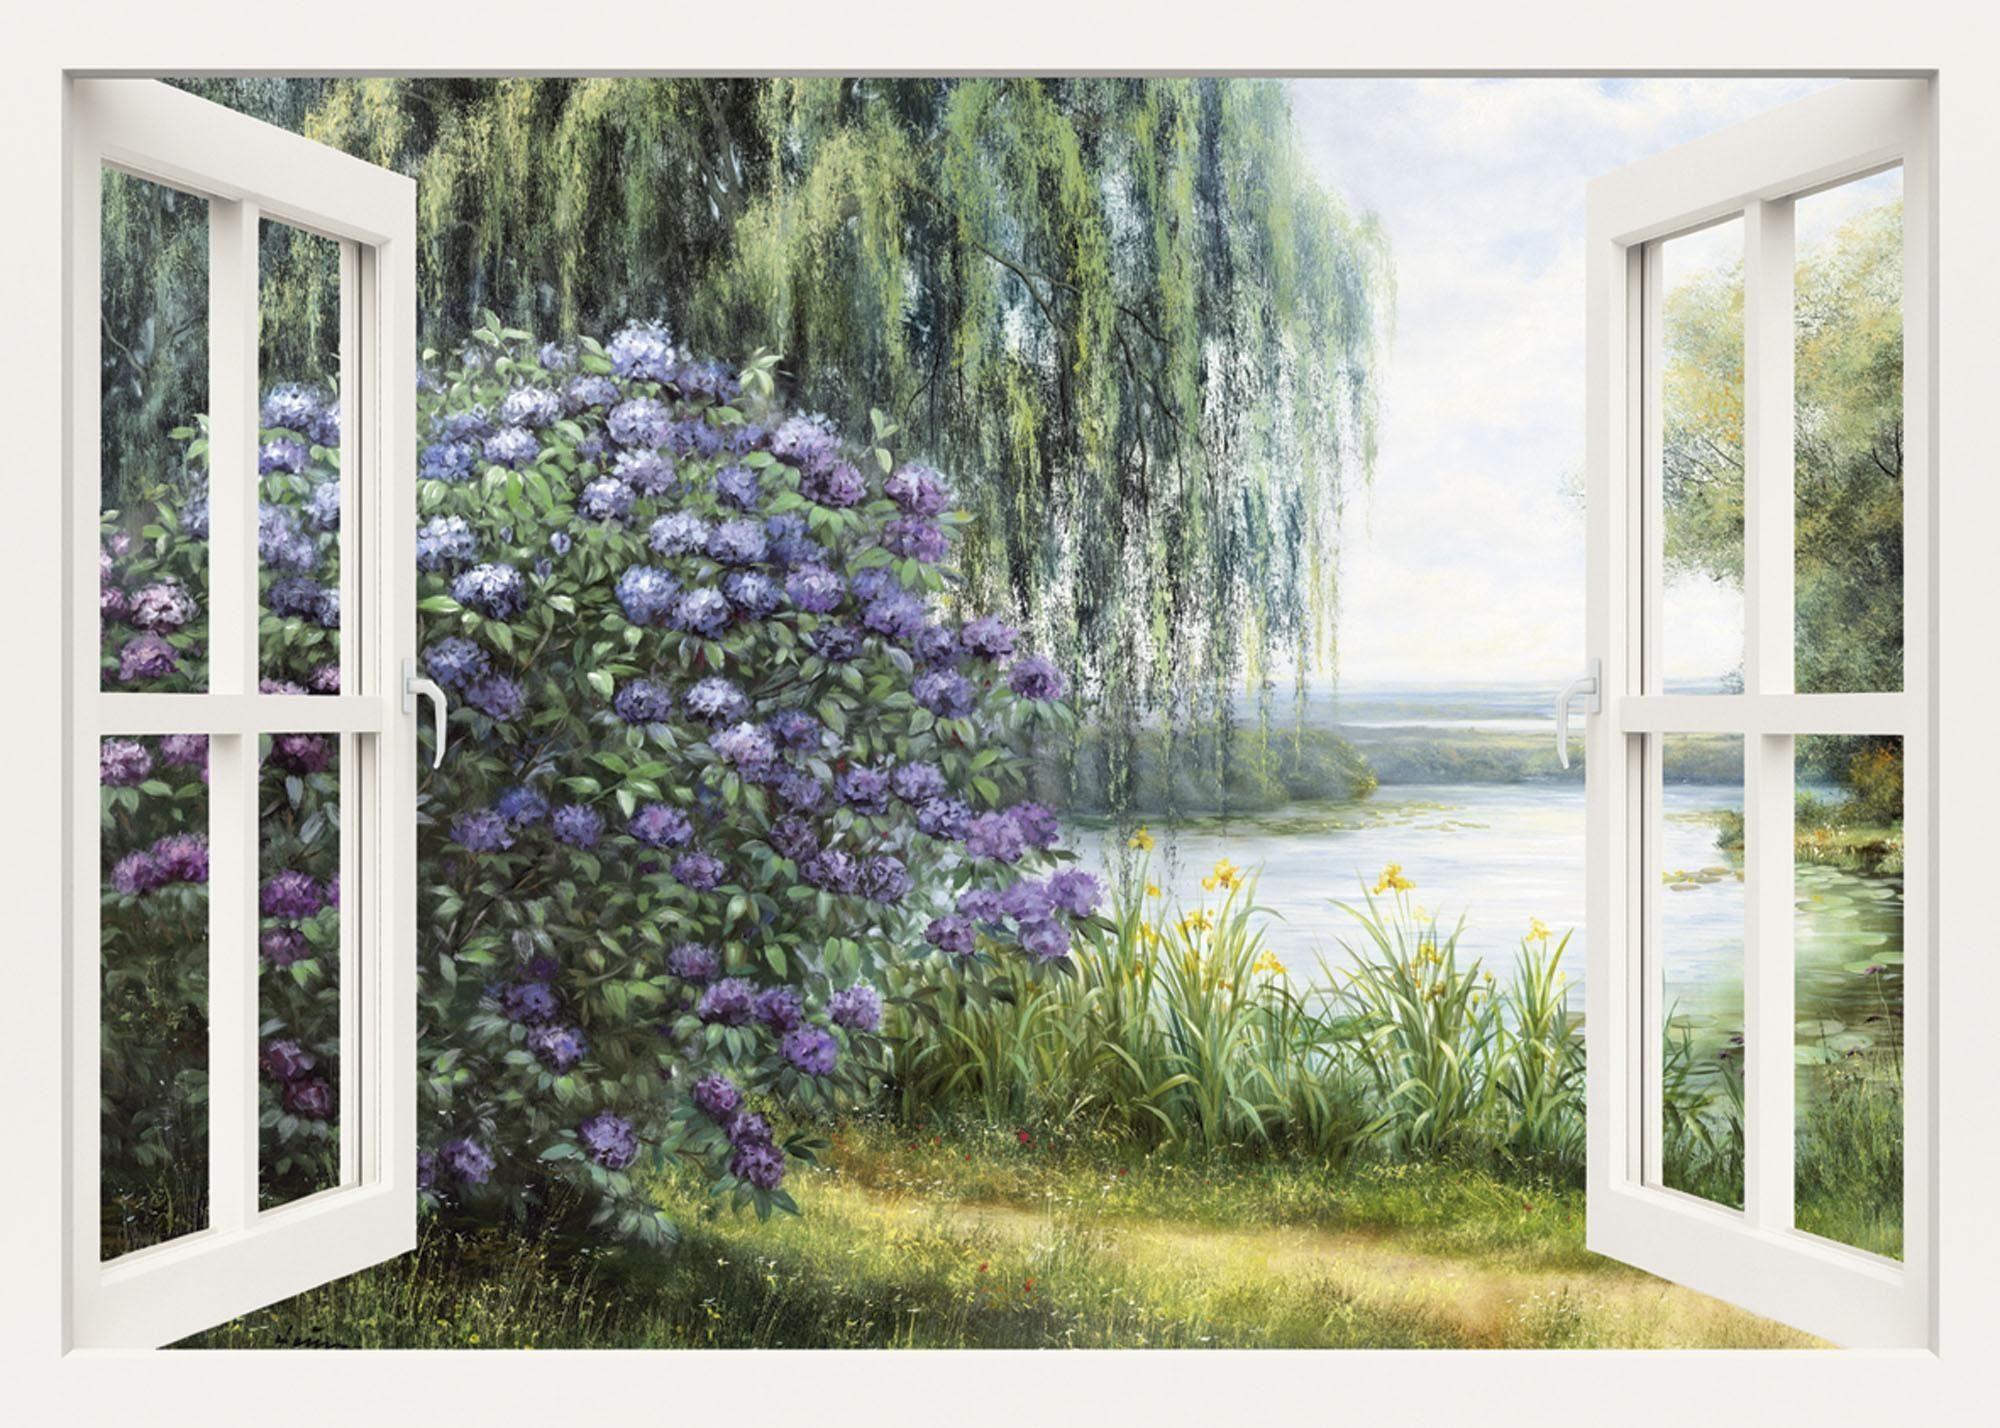 Home affaire, Leinwandbild, »Heins, A.: Hortensien am See«, 100/70 cm